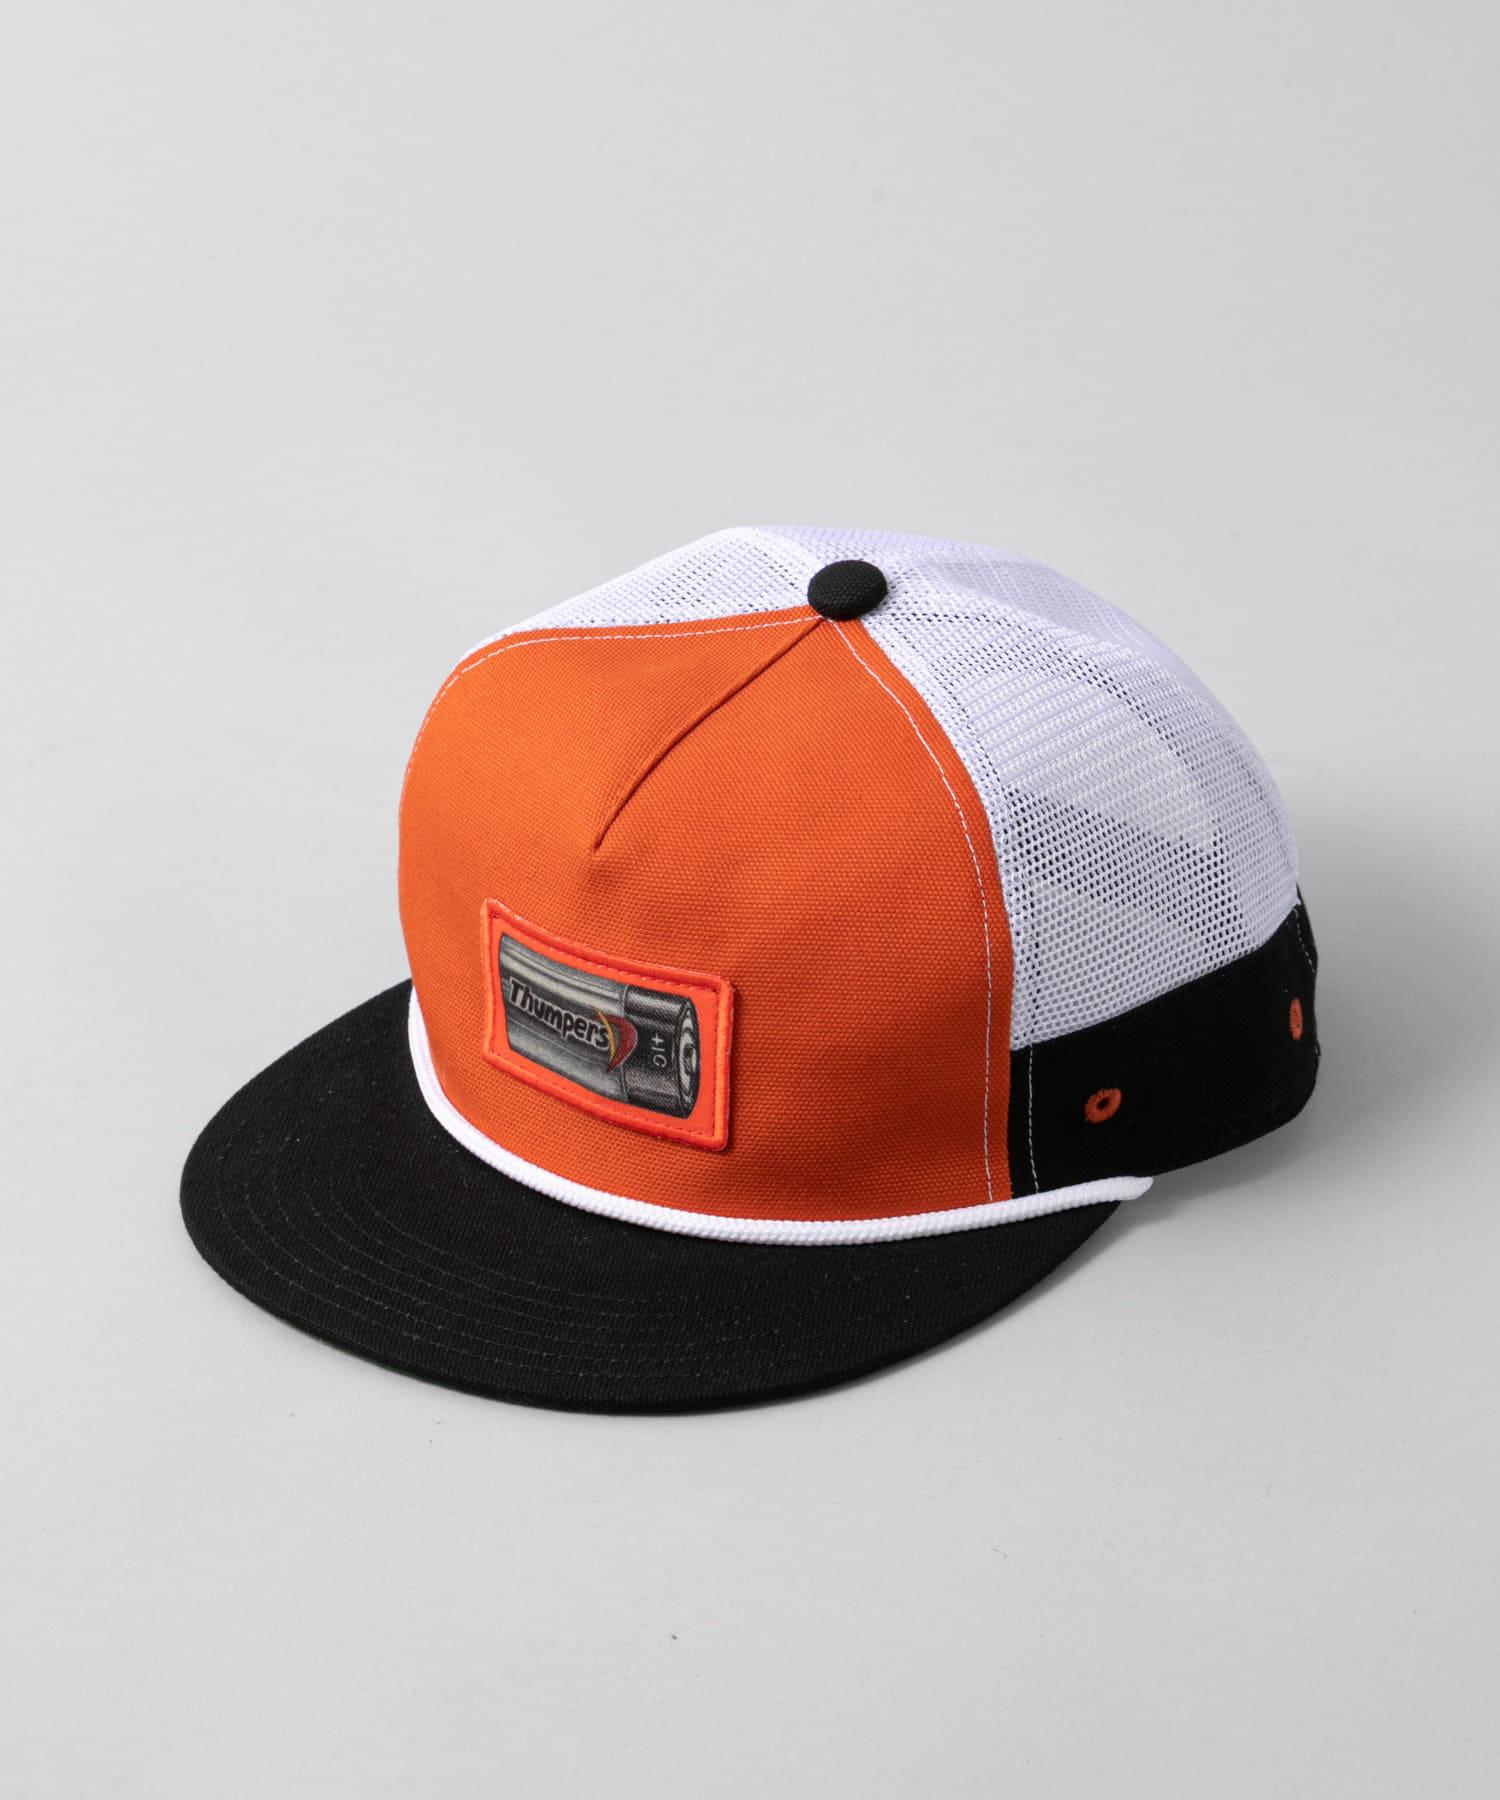 CIAOPANIC(チャオパニック) 【THUMPERS/サンパース】PENCIL DRAWING MESH CAP